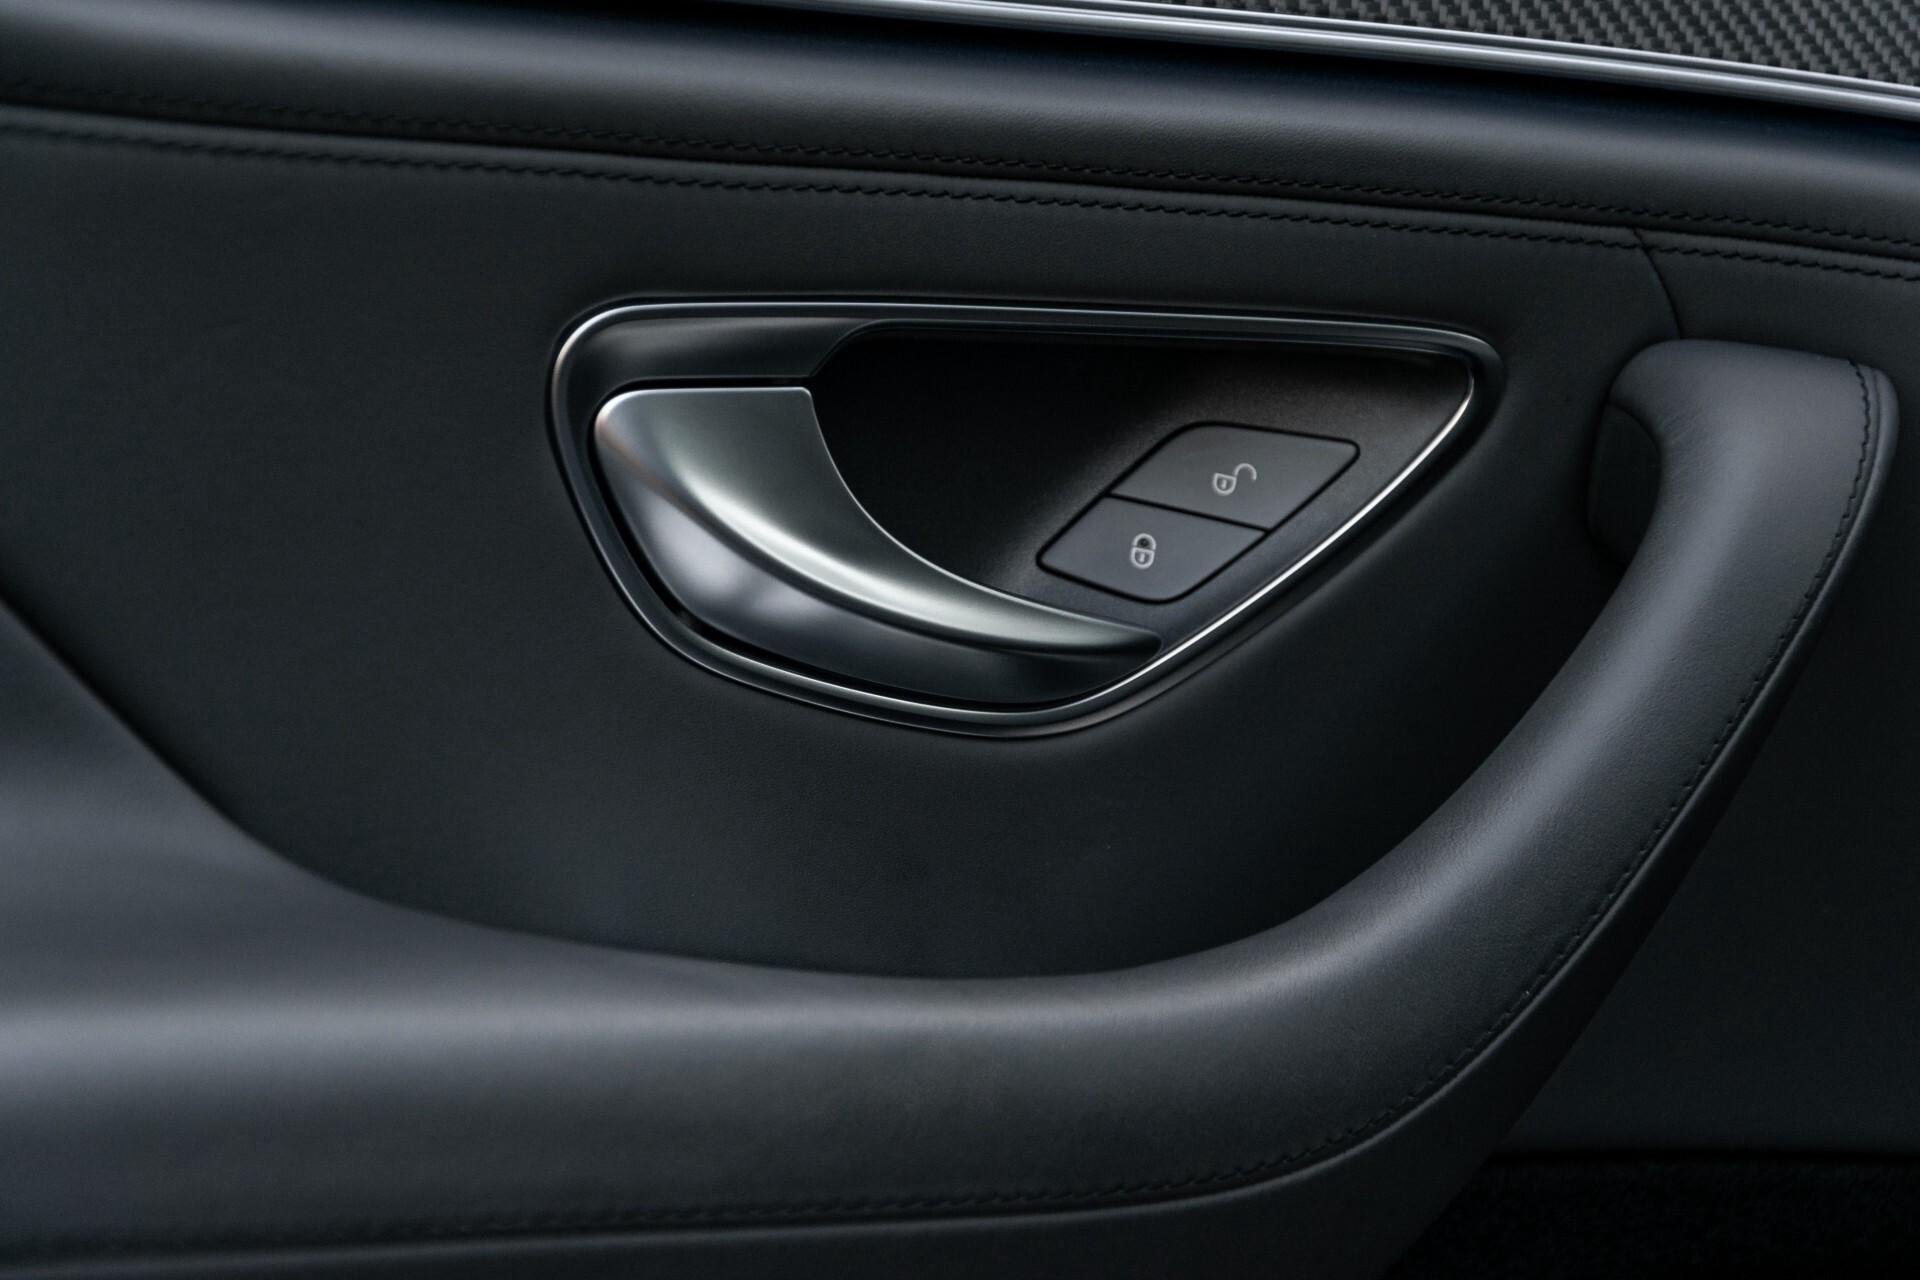 Mercedes-Benz AMG GT 4-Door Coupe 63 S 4MATIC+ Edition 1 Keramisch/Carbon/First Class/Dynamic Plus/Burmester High End 3D Aut9 Foto 22